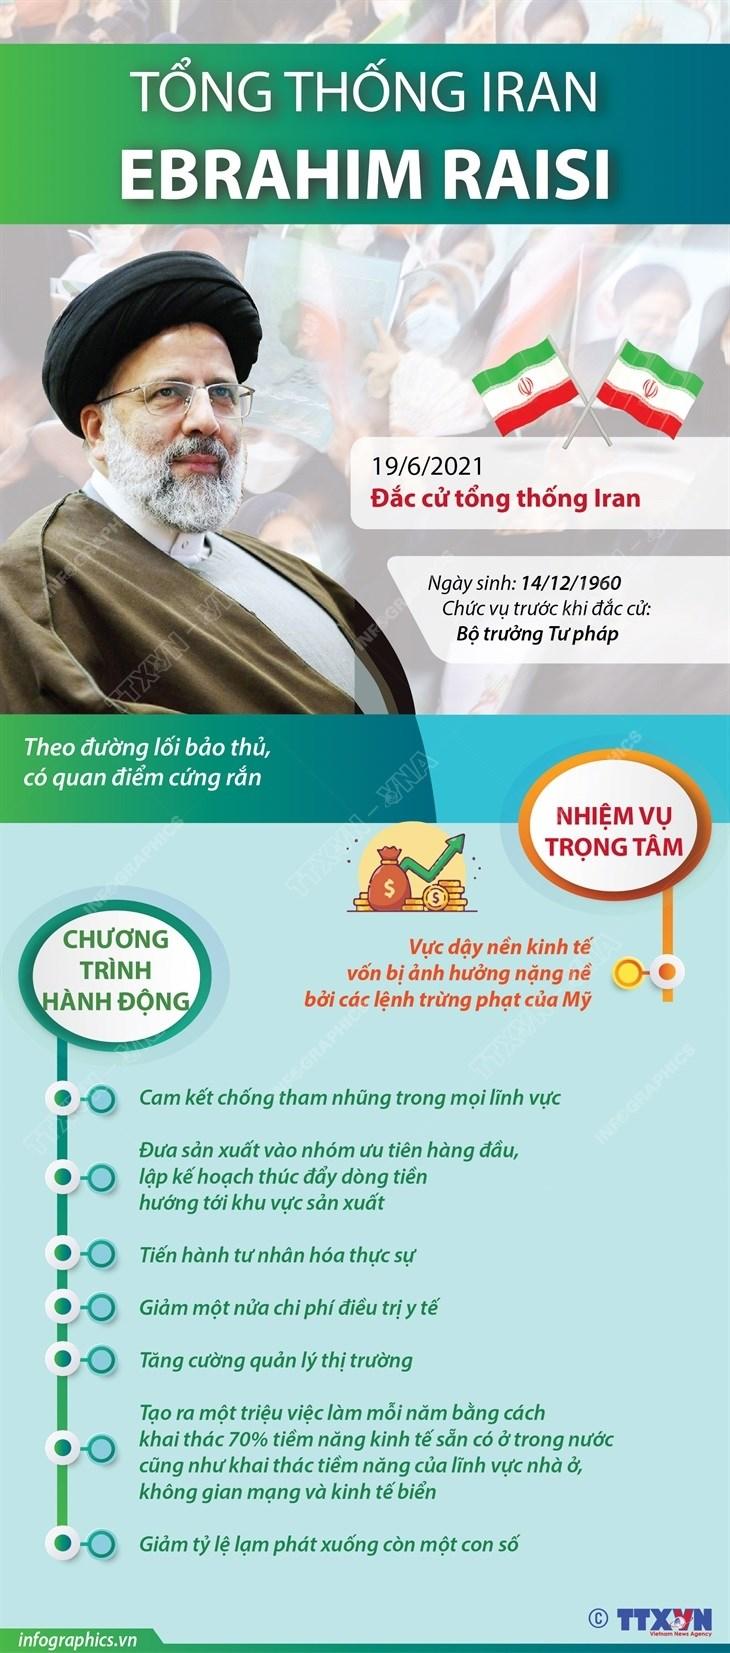 Bo truong Tu phap Ebrahim Raisi tro thanh tan Tong thong Iran hinh anh 1